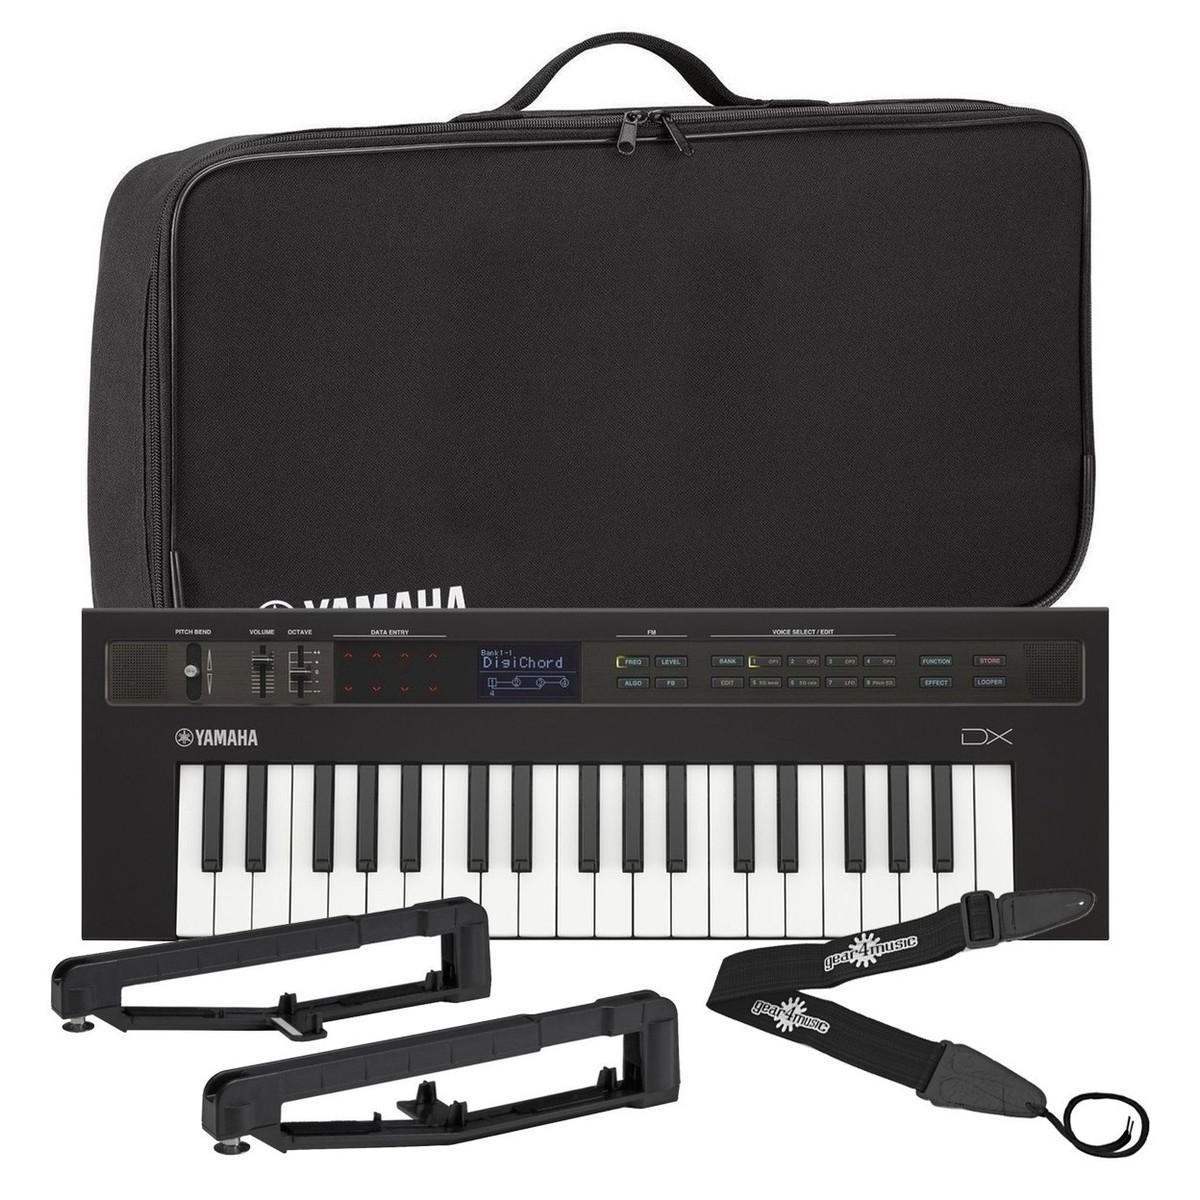 Yamaha reface DX Synthesizer With Yamaha Bag And Strap Kit